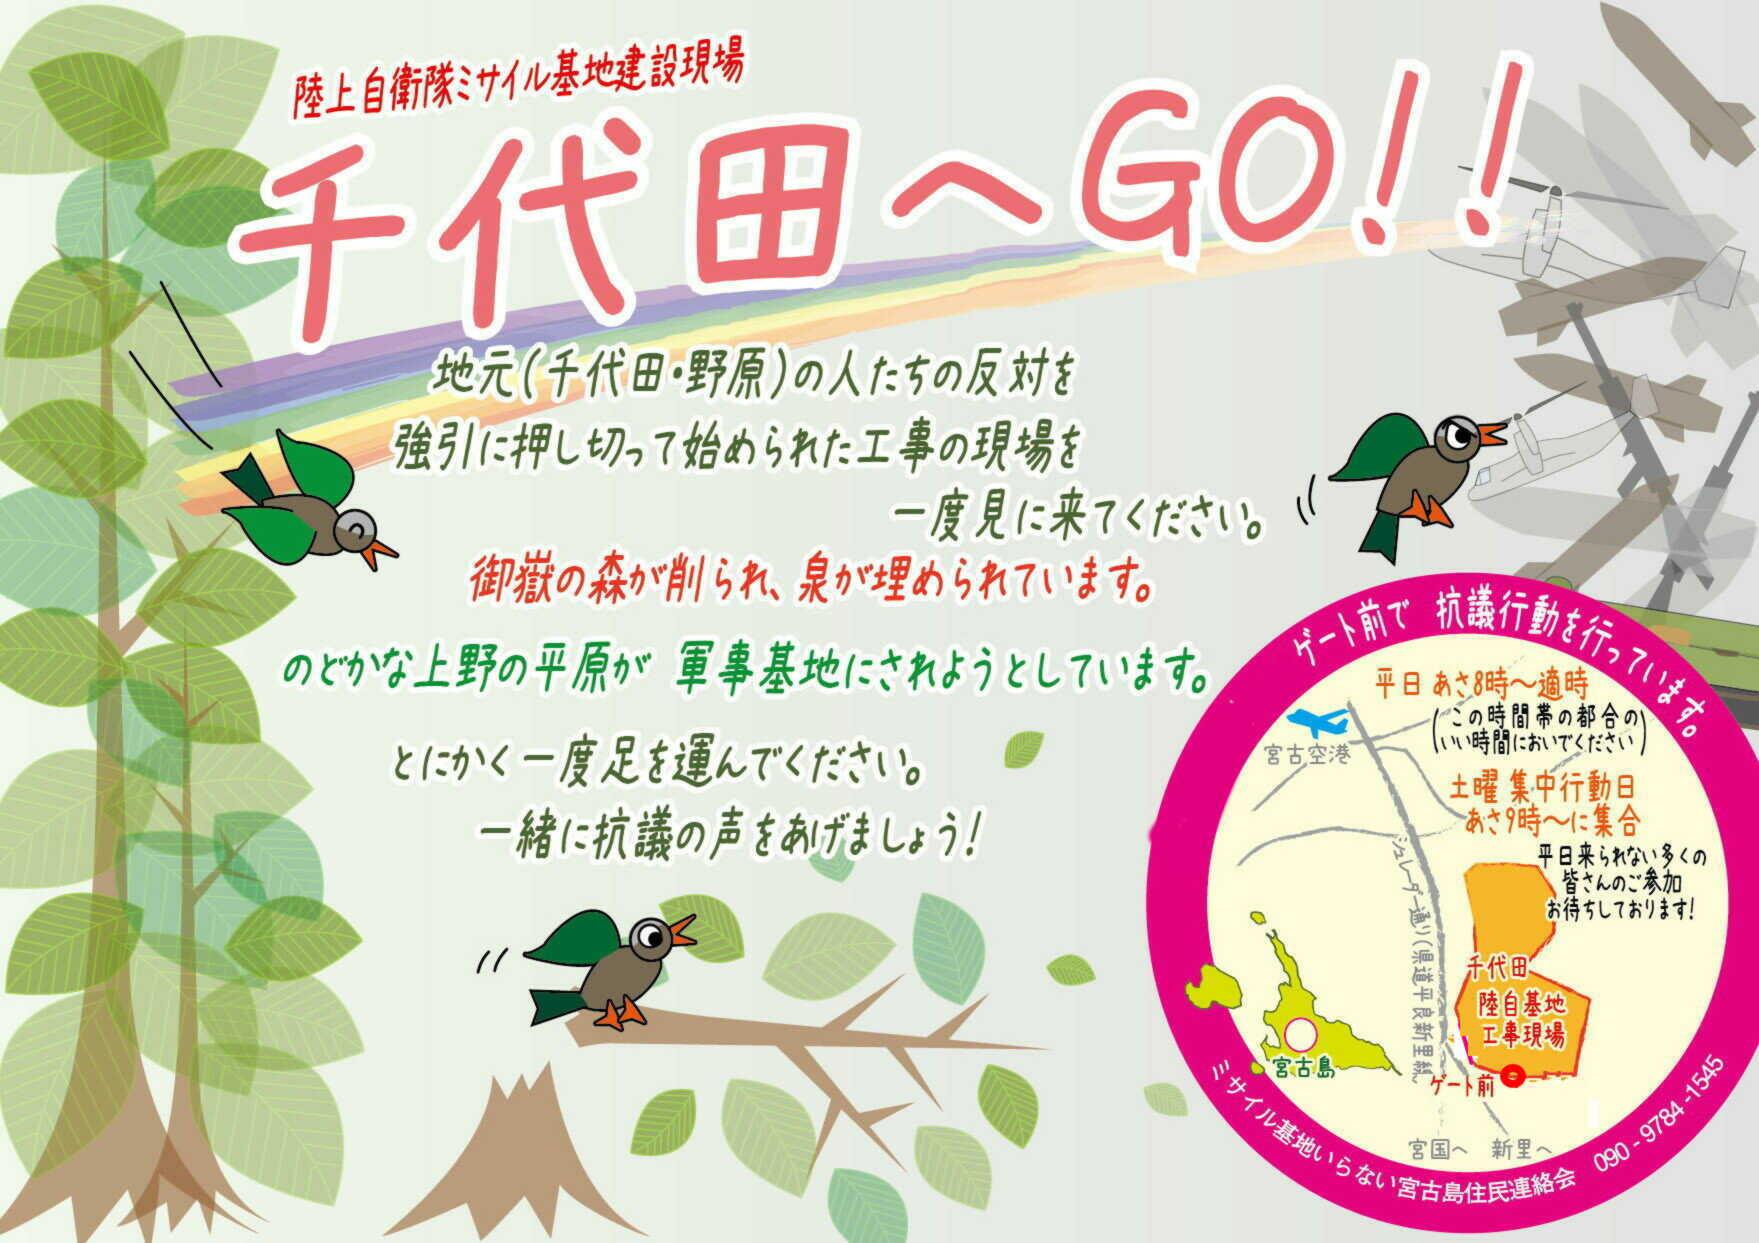 chiyodachirasi01Rev2.jpg